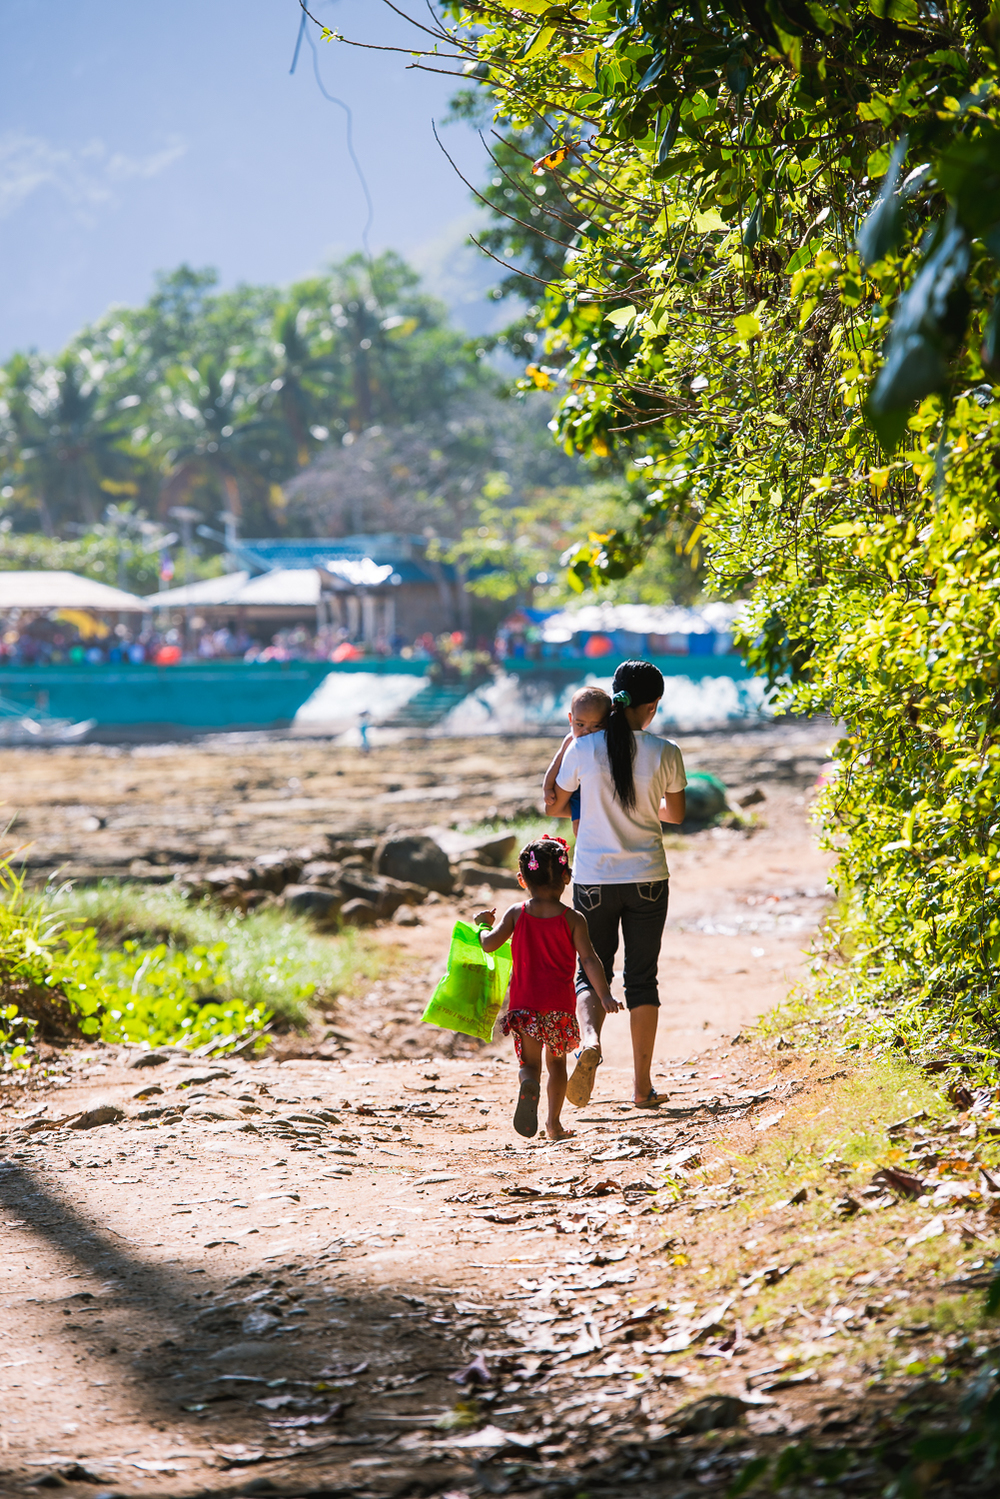 2016 Philippines Trip - Part 2 - Palawan LR-78.jpg